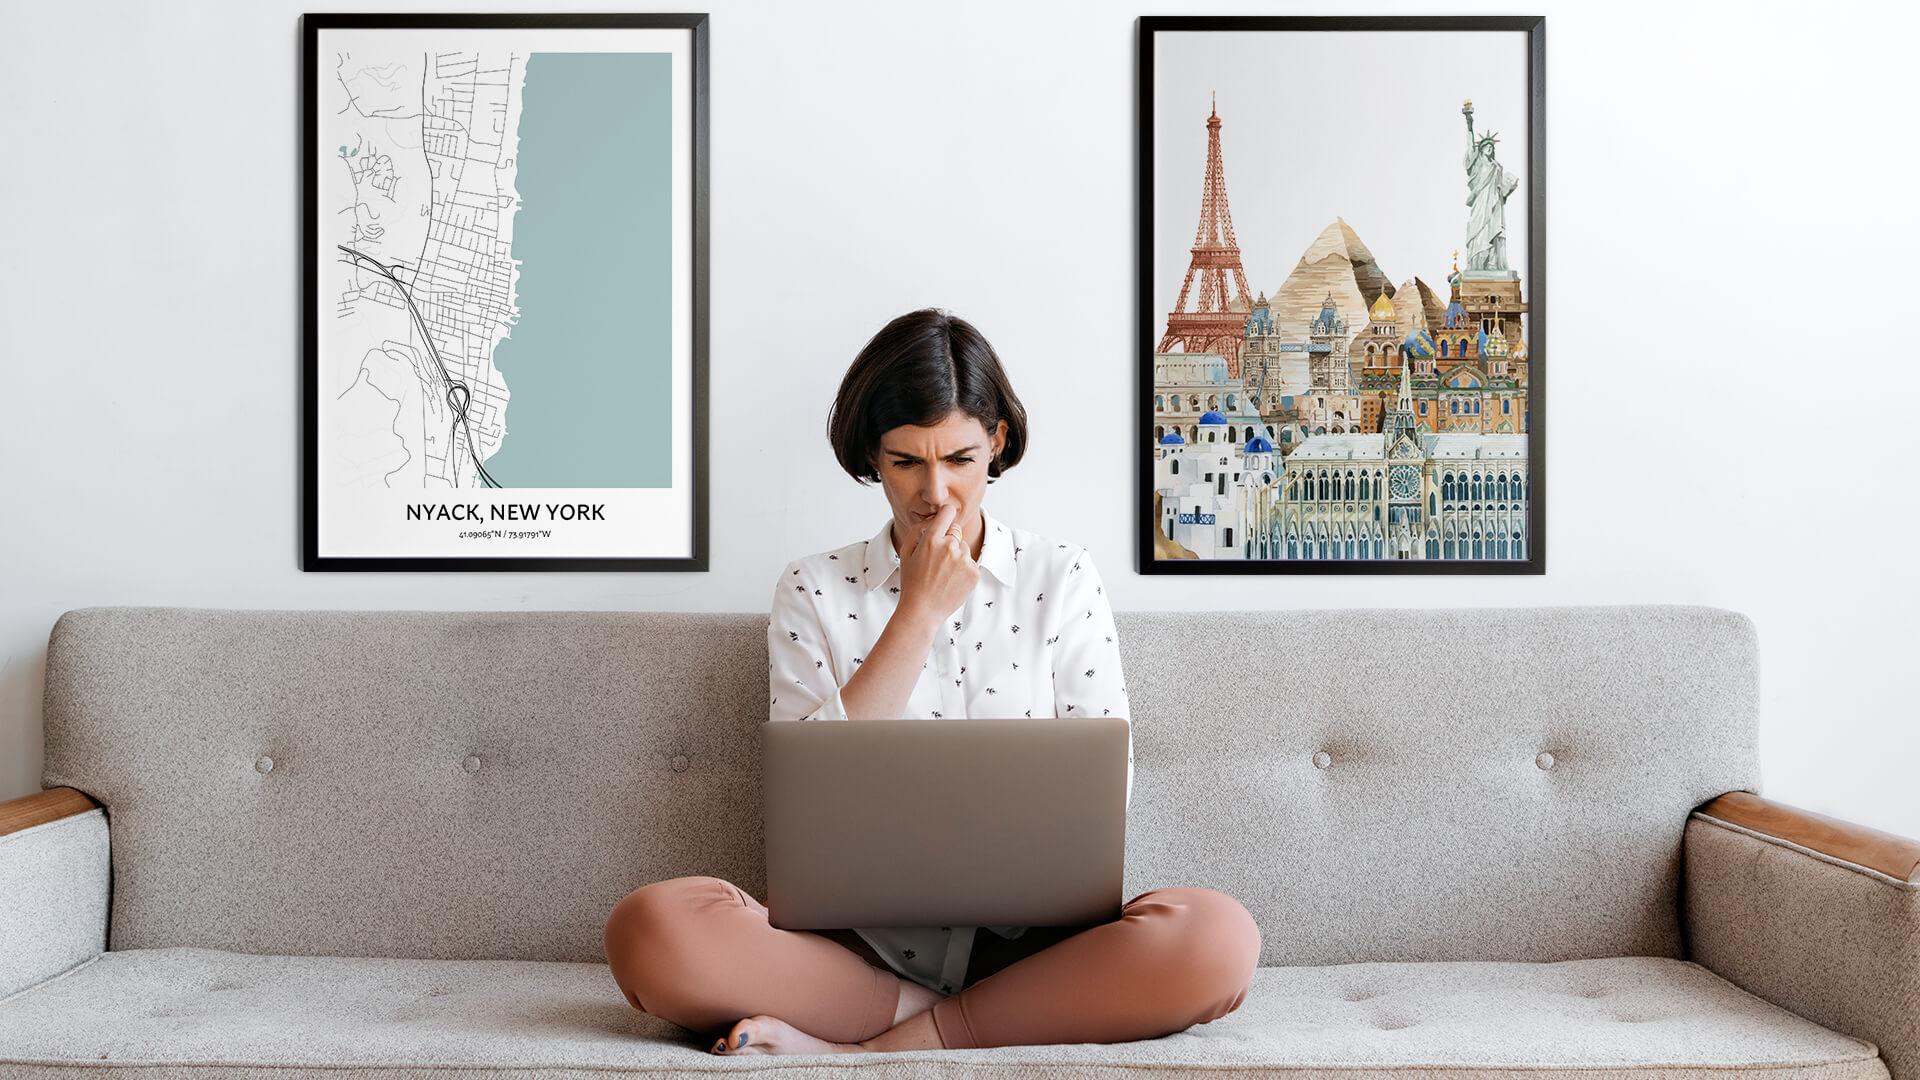 Nyack city map art